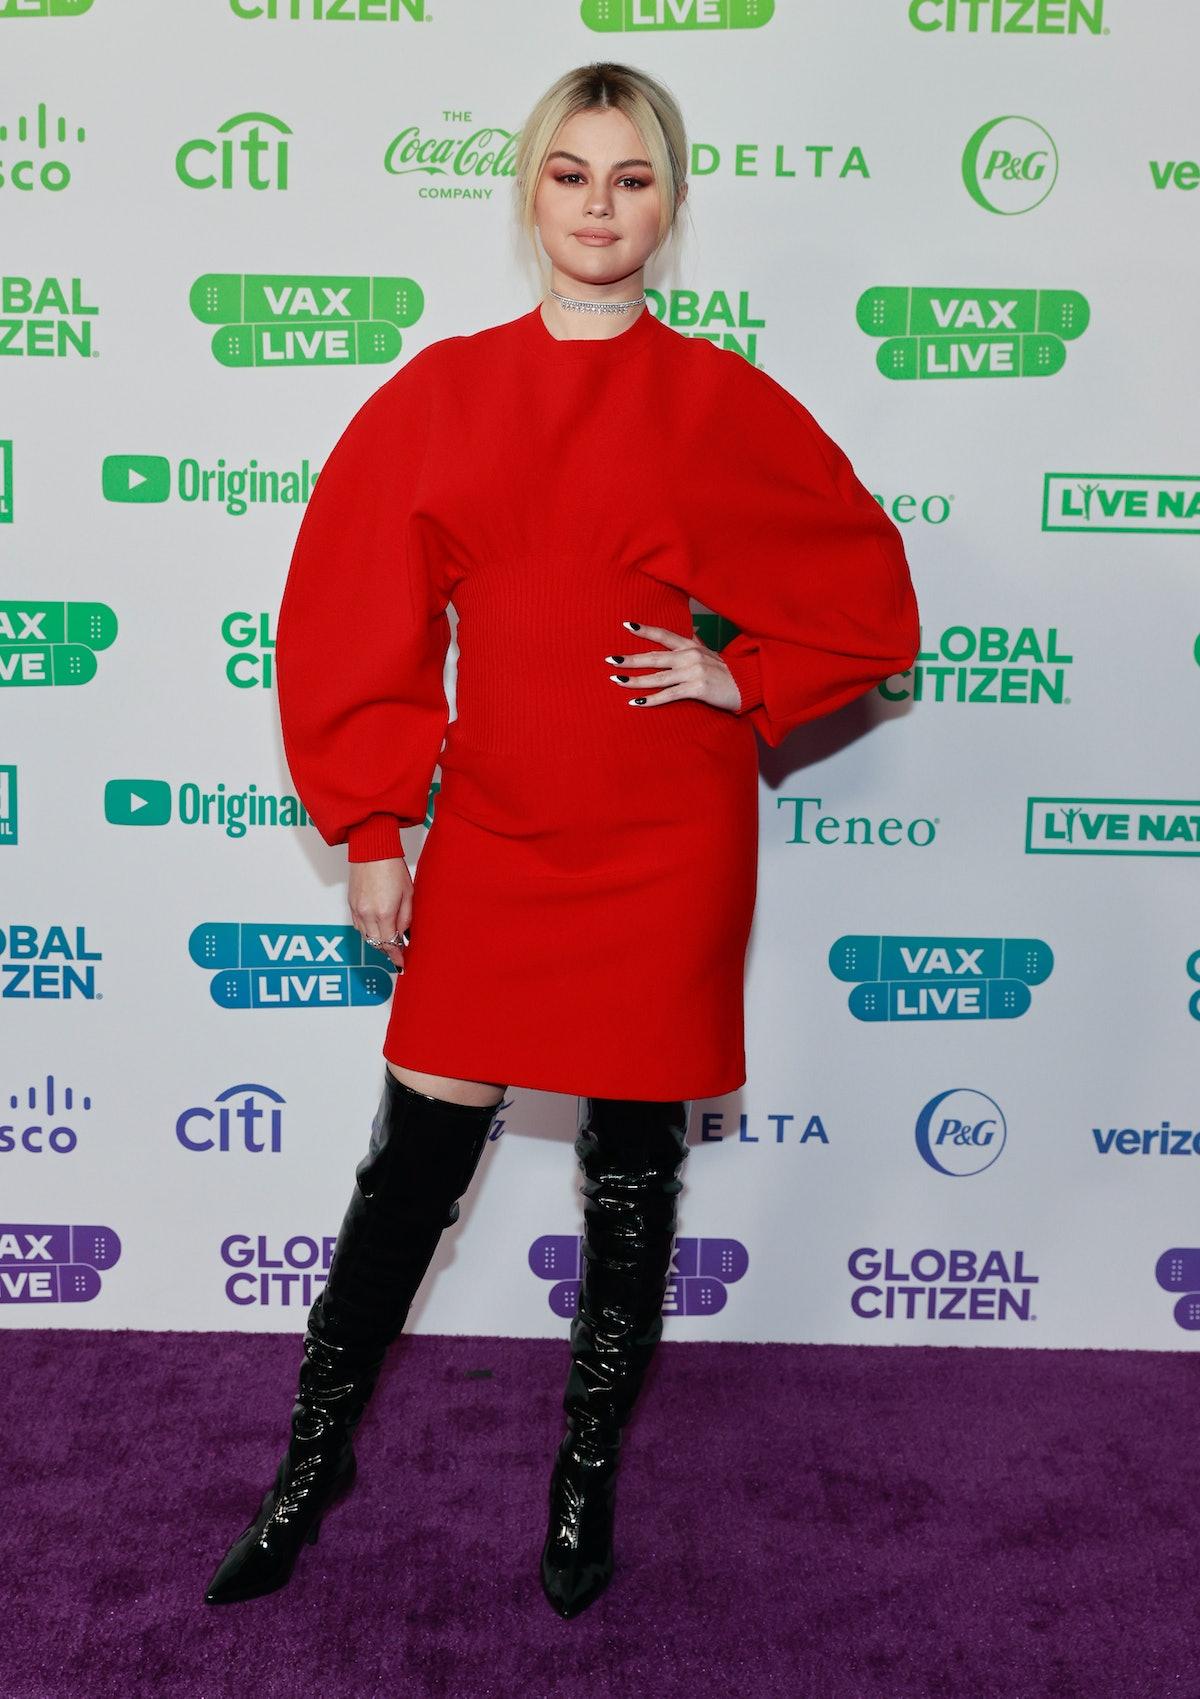 Selena Gomez wearing red